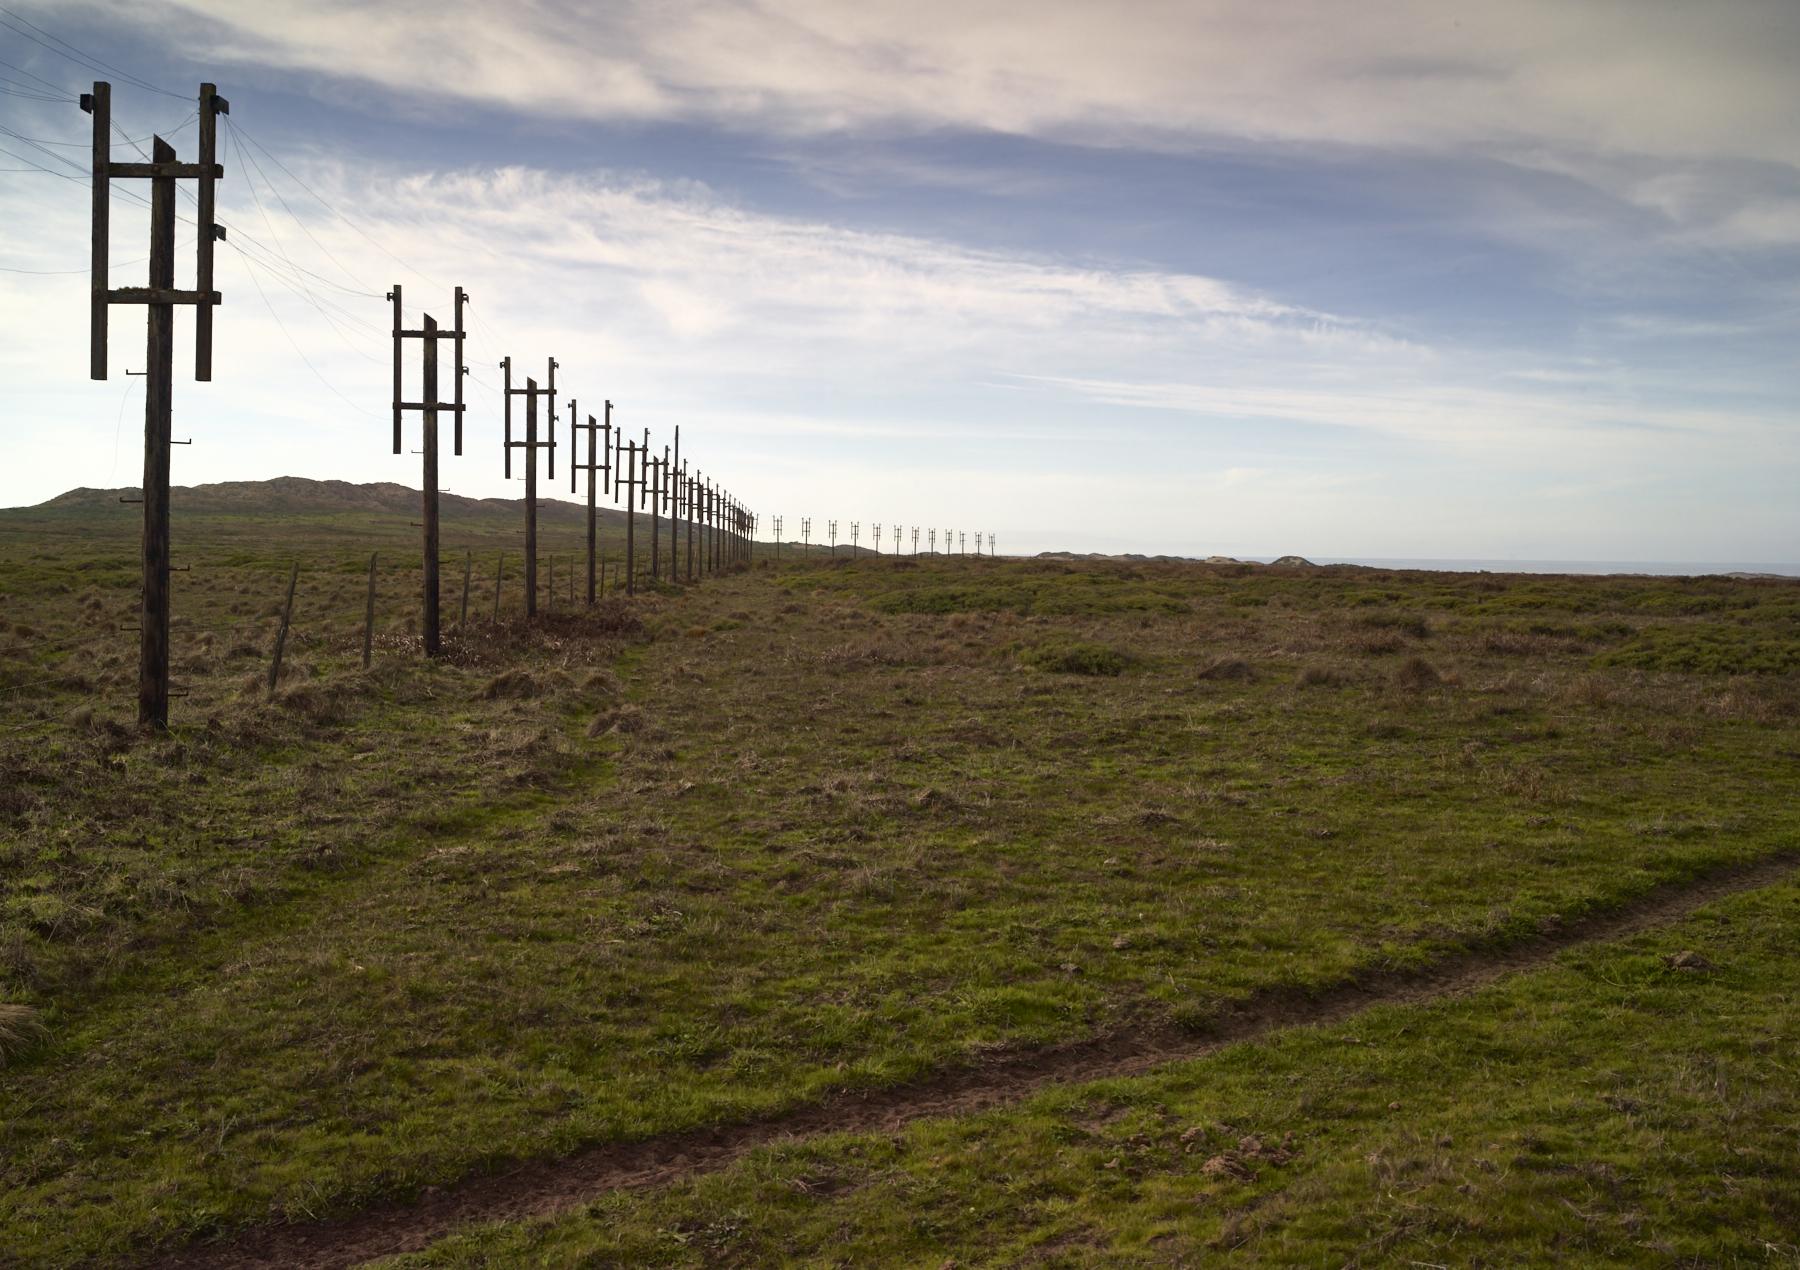 Pt Reyes Telegraph Poles